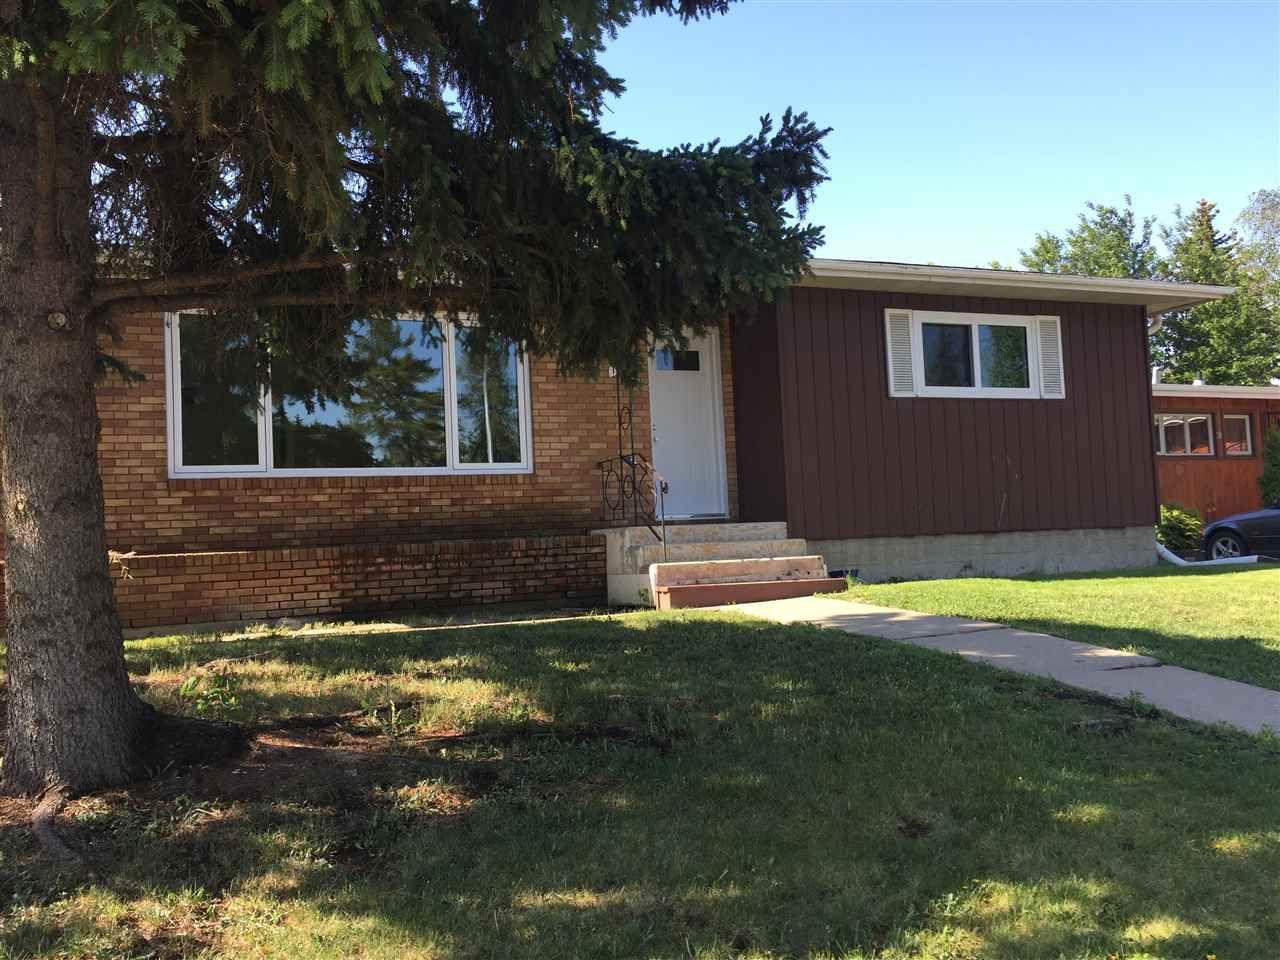 Main Photo: 11423 51 Avenue NW in Edmonton: Zone 15 House for sale : MLS®# E4160554